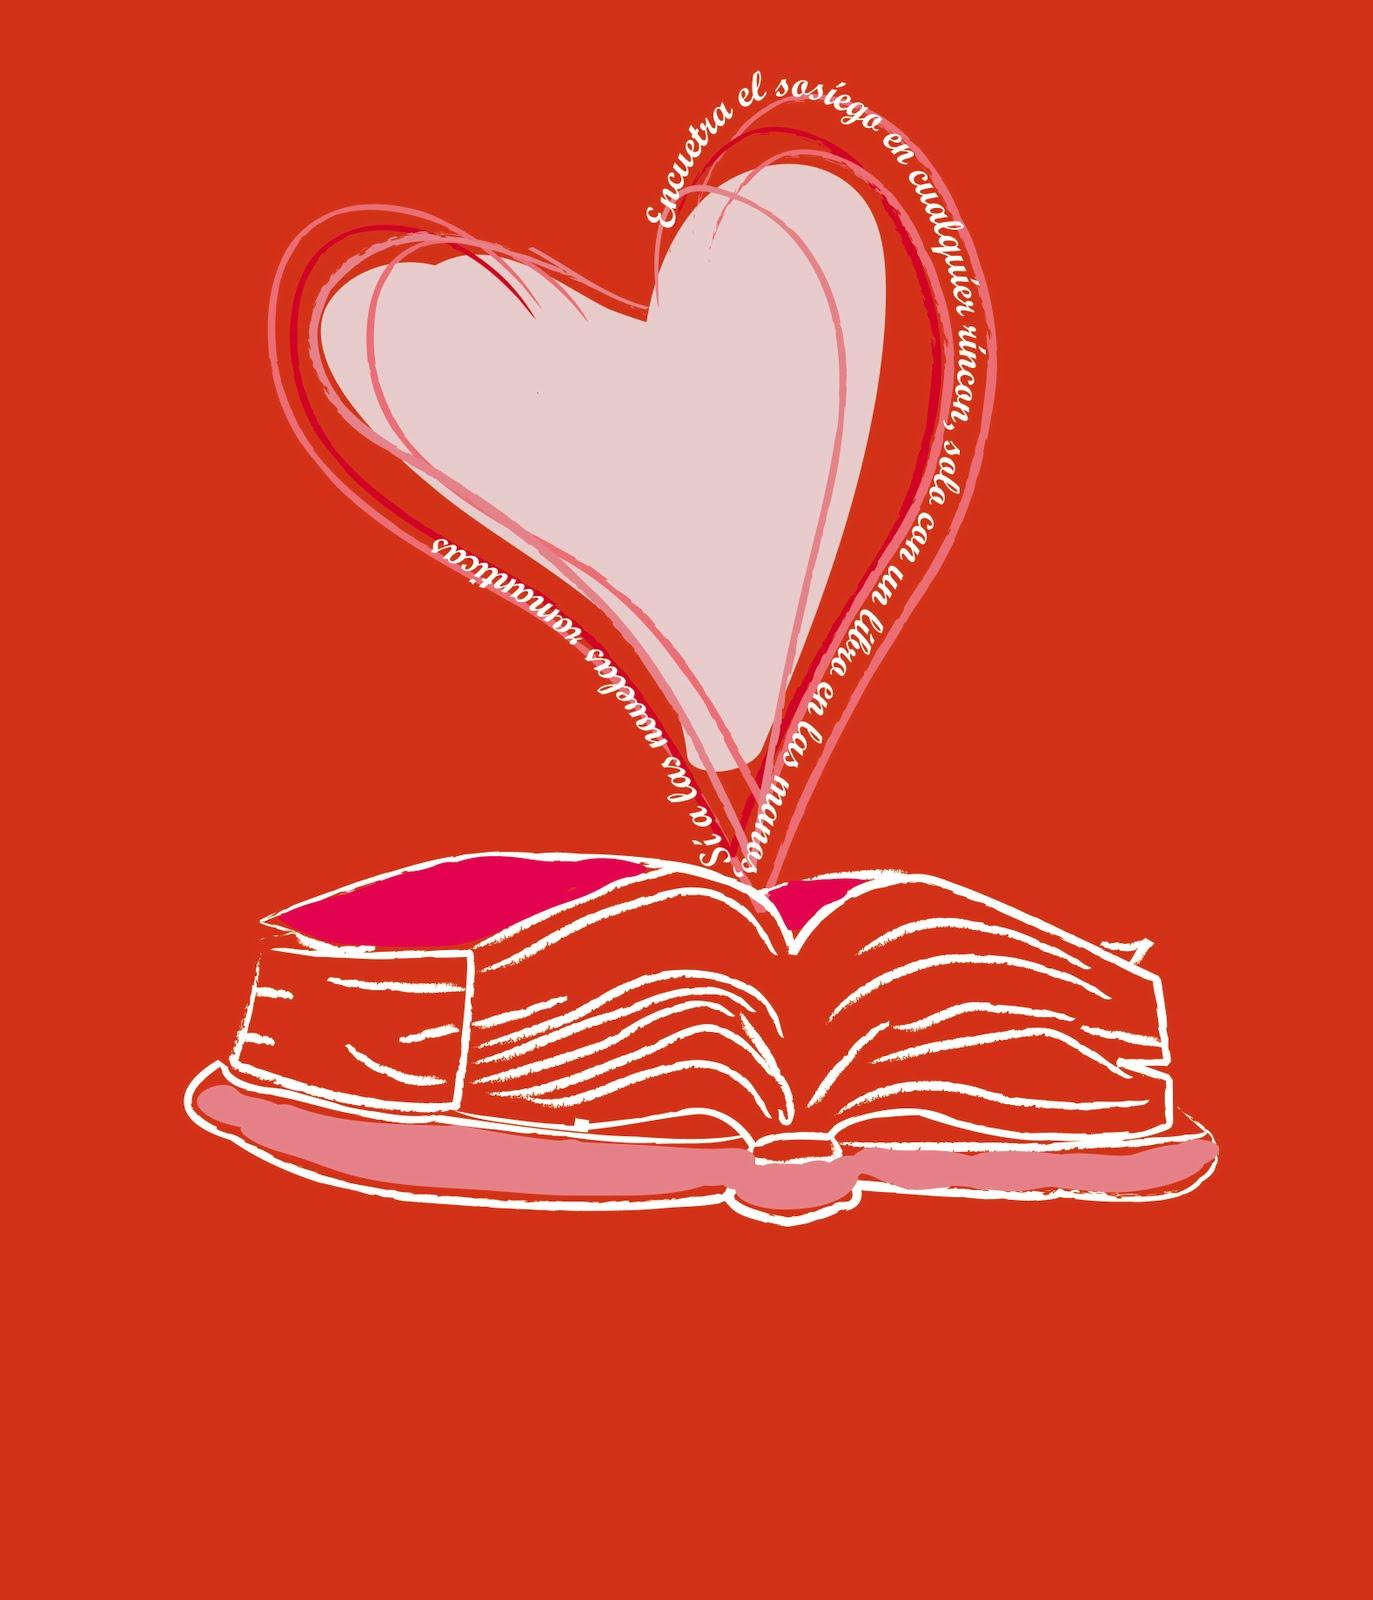 2011 novelas romanticas harlequin descargar - Libros harlequin gratis ...